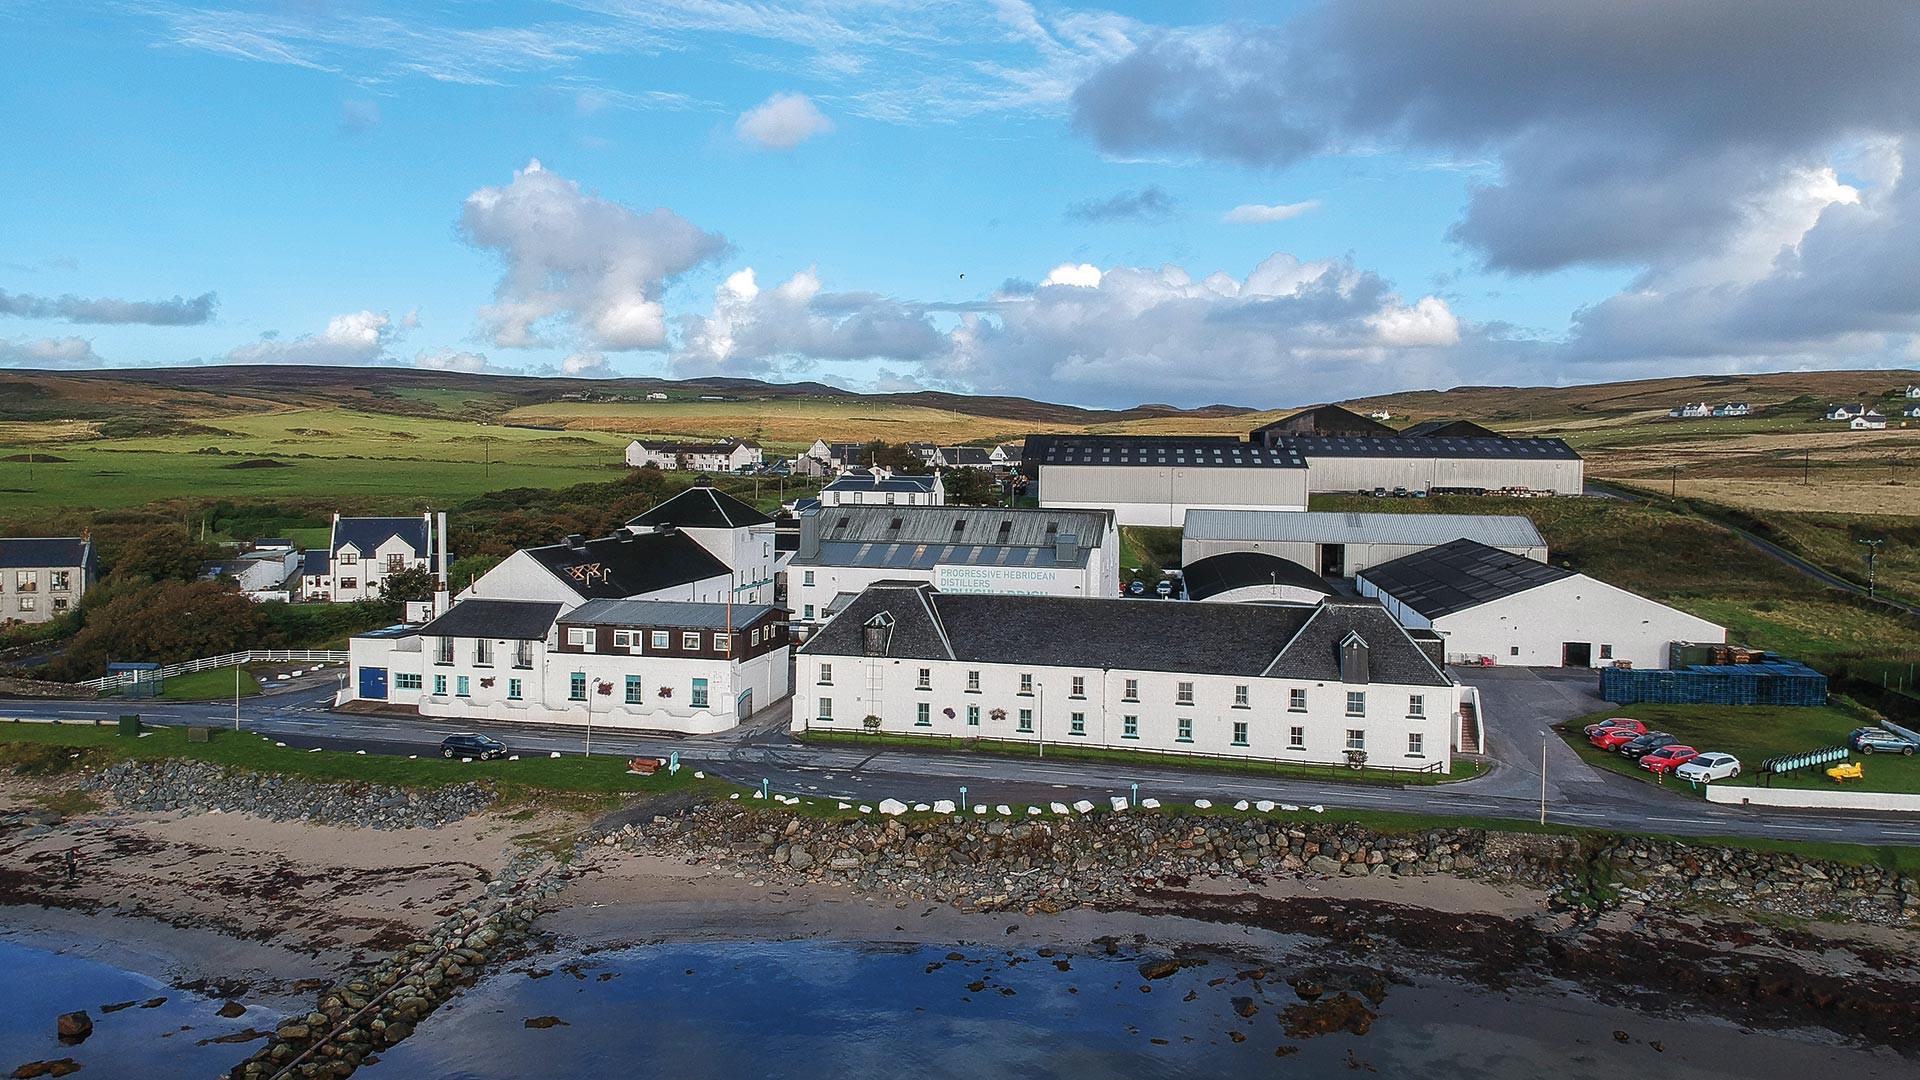 The Bruichladdich distillery on Islay